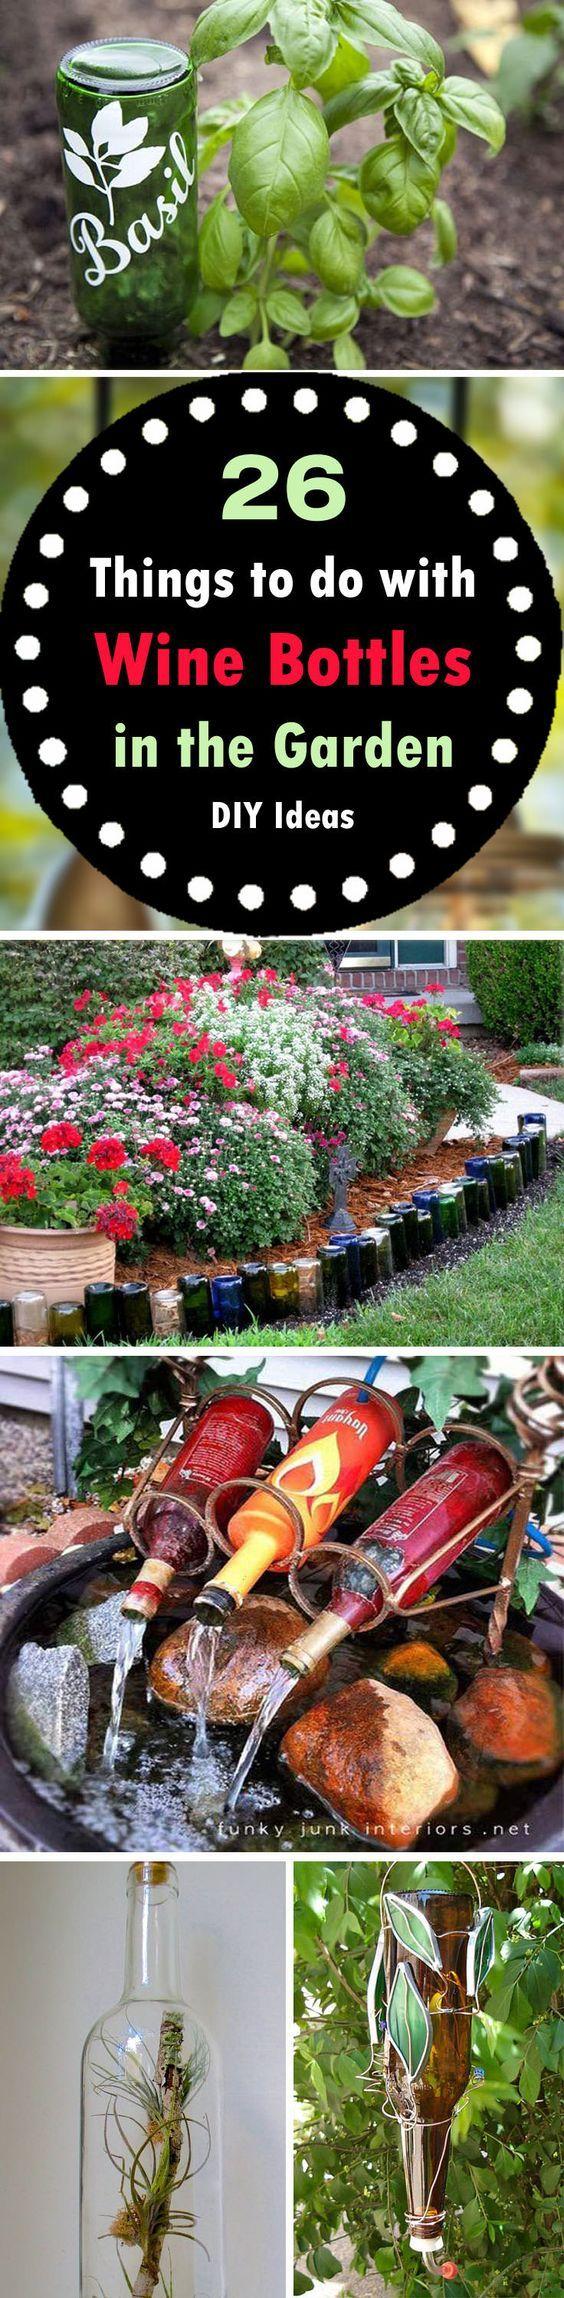 DIY Wine Bottle Ideas for Garden